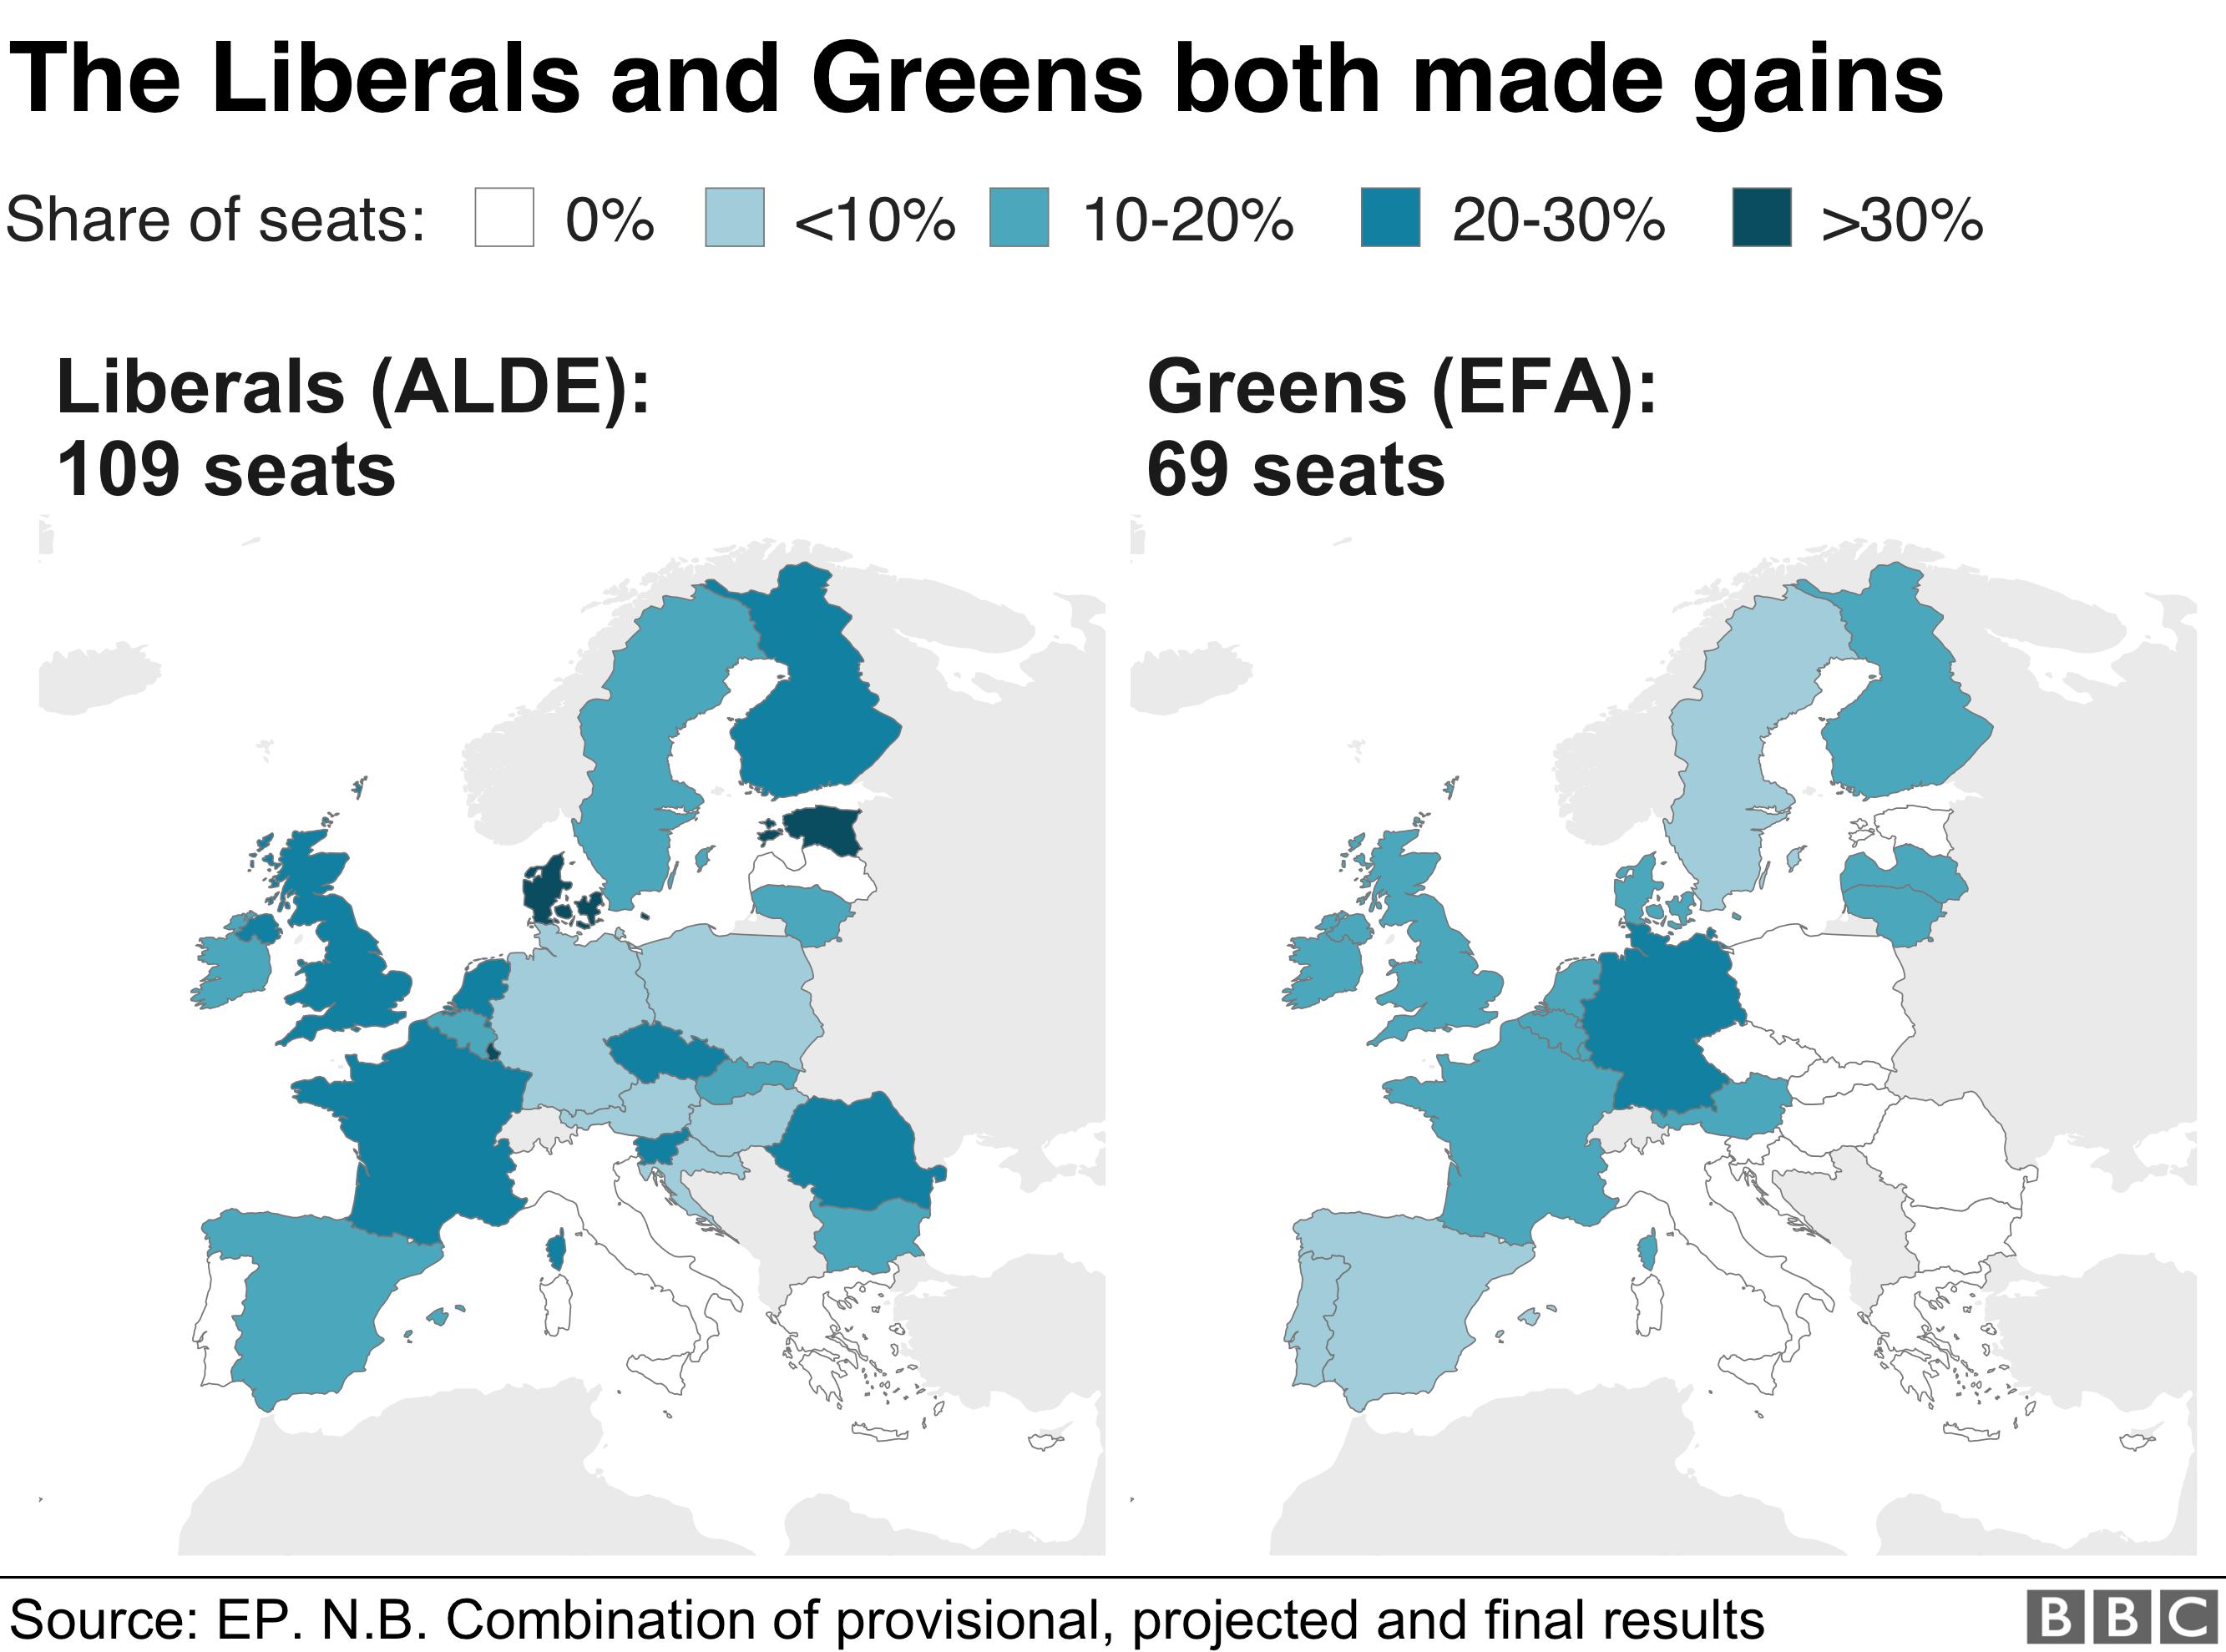 Greens and Liberals both made big improvements